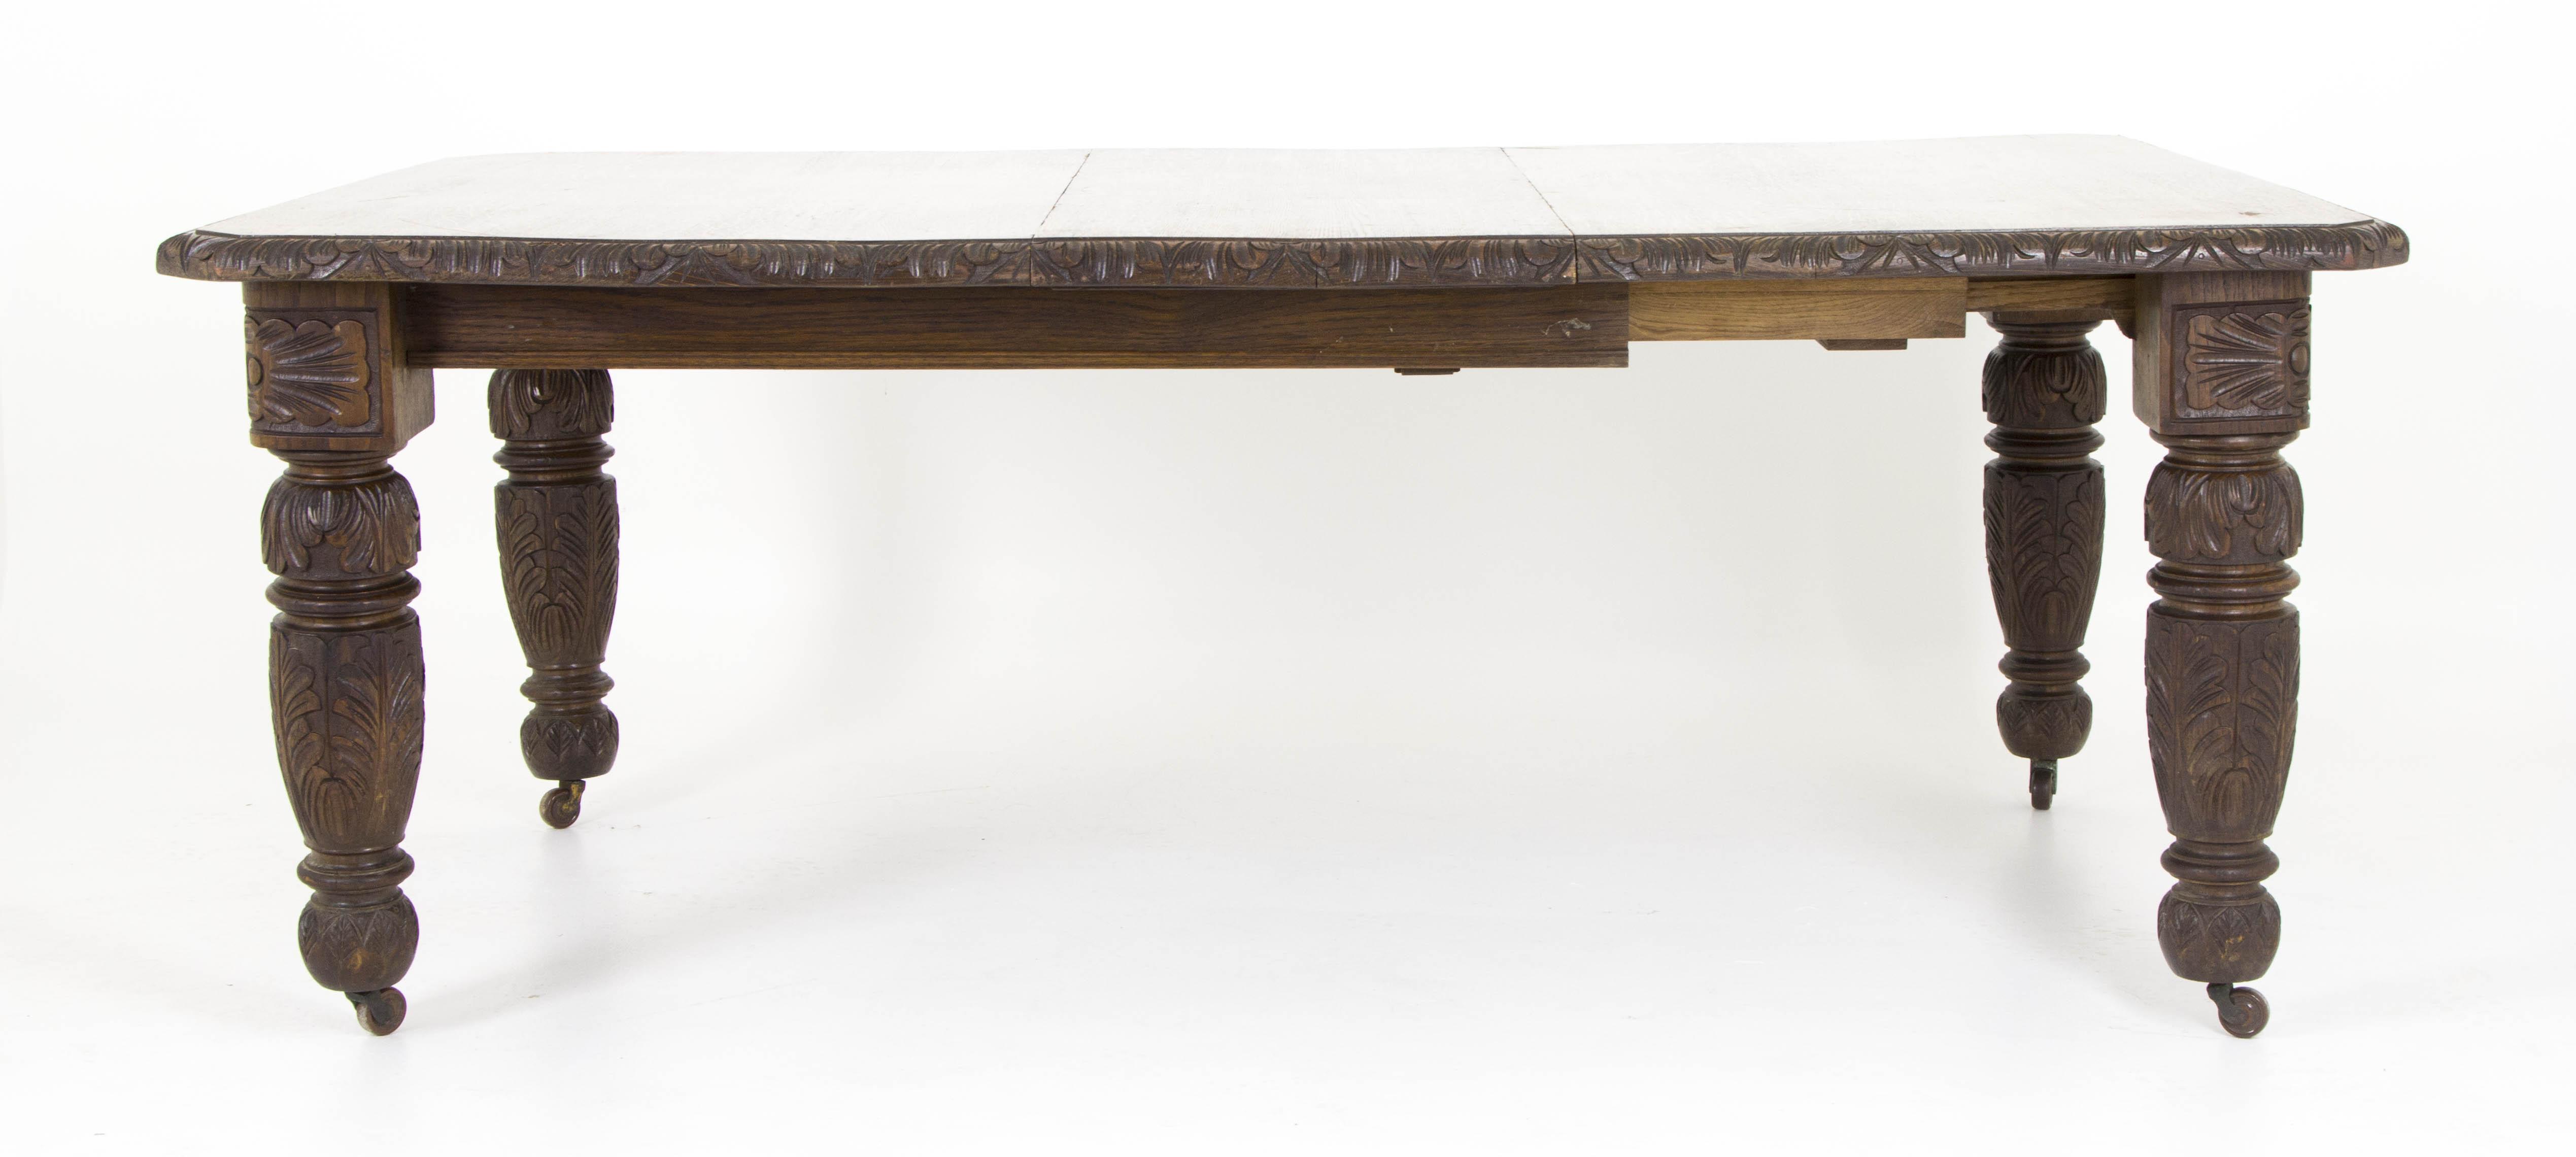 100 antique oak coffee tables sold hamilton signed vintage